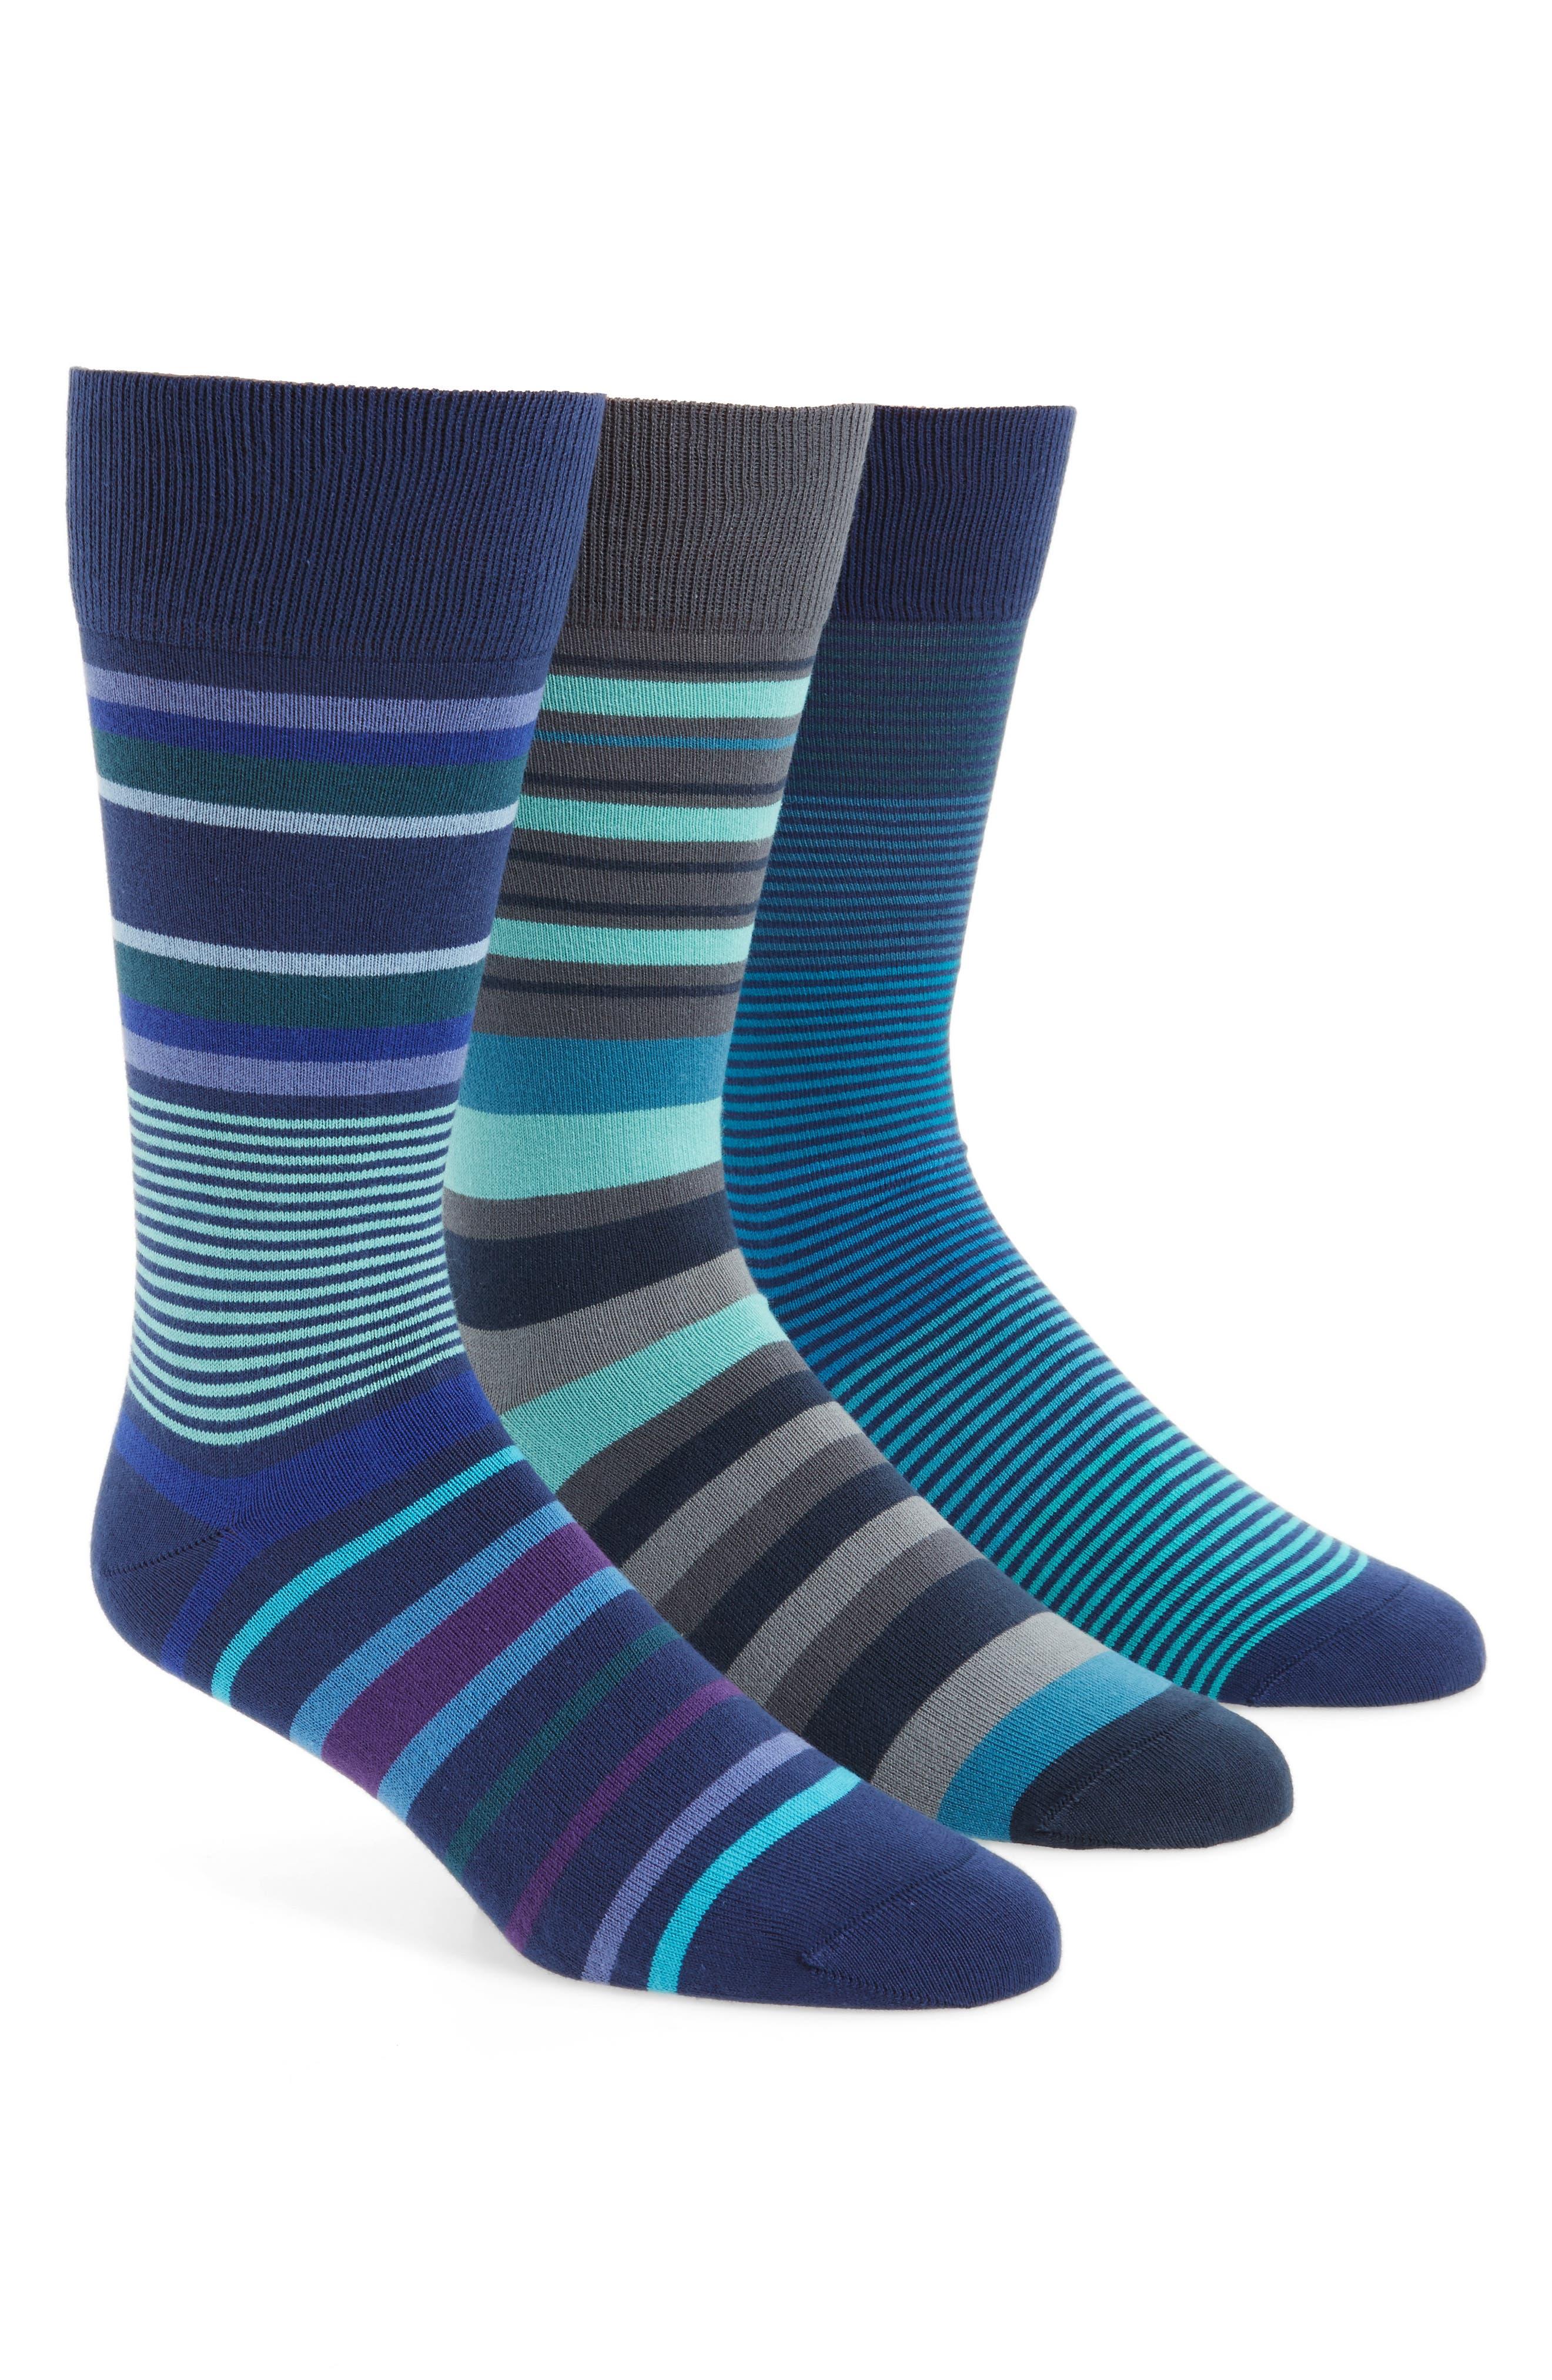 3-Pack Stripe Socks,                             Main thumbnail 1, color,                             434